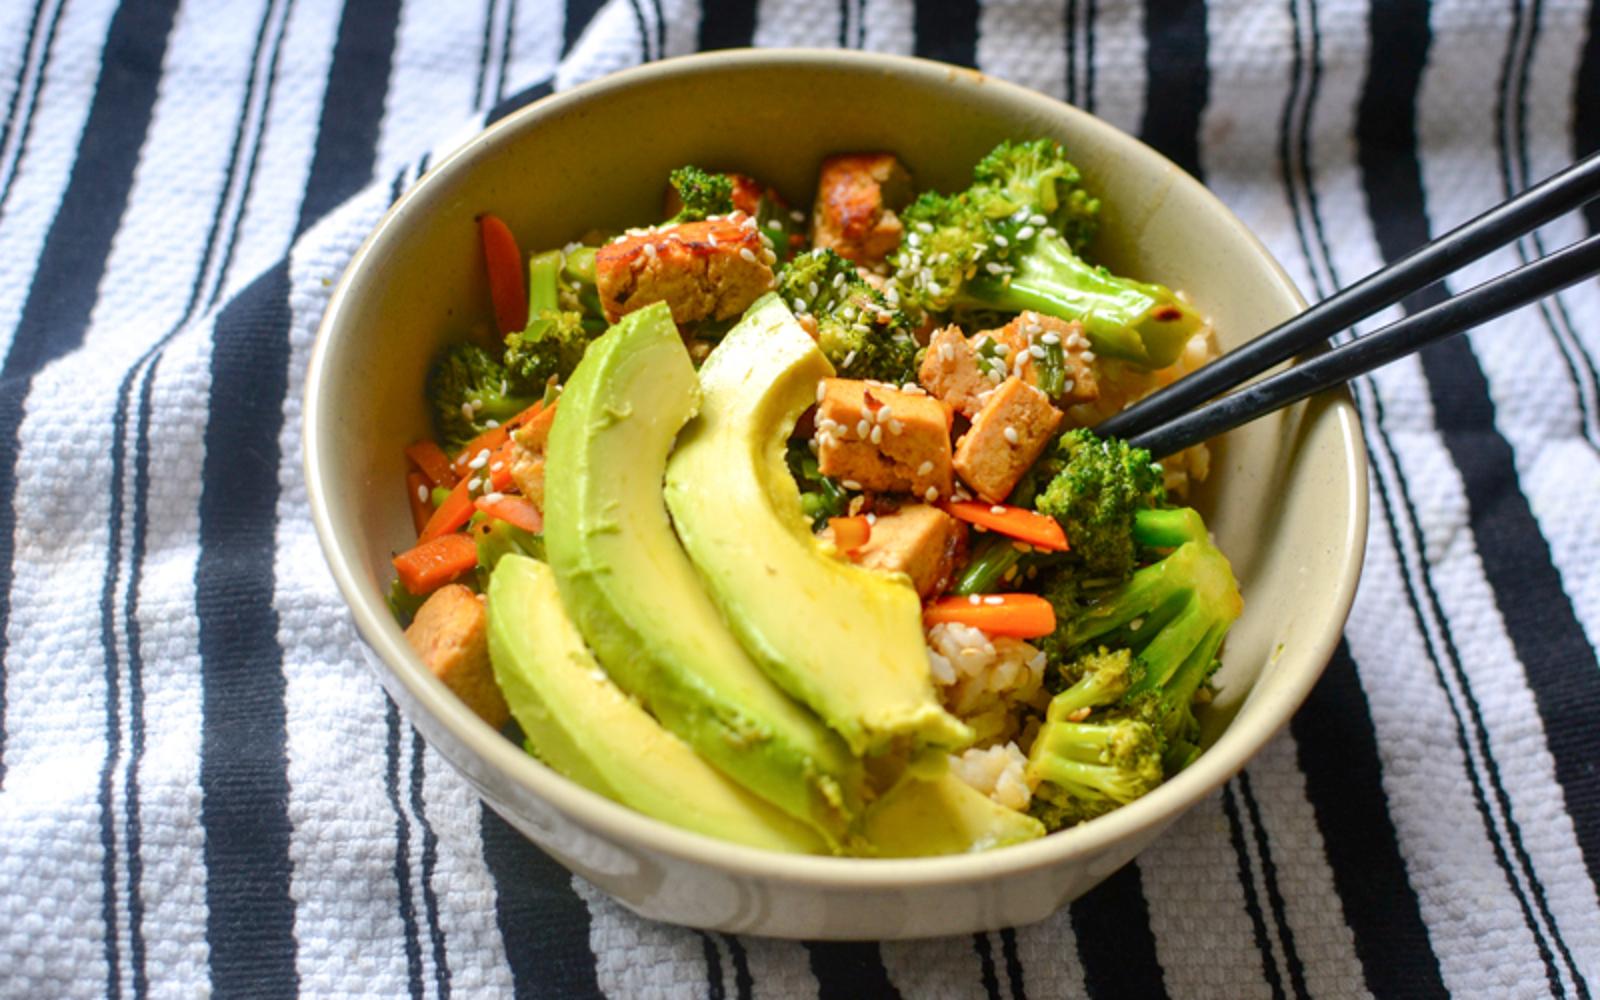 Sriracha and Lemongrass Marinated Tofu Bowls